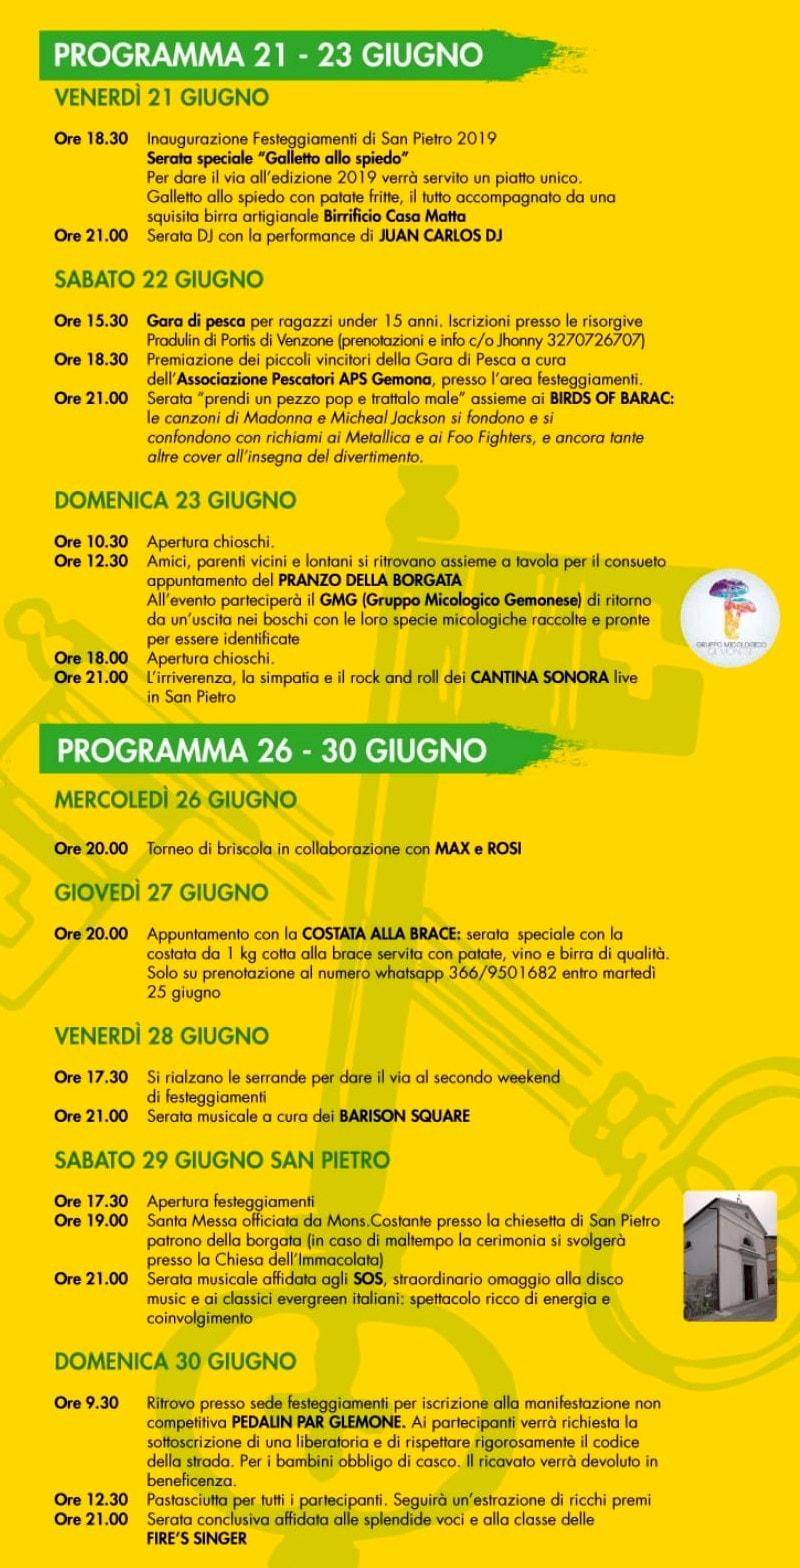 Programma Sagra di Campagnola 2019-2